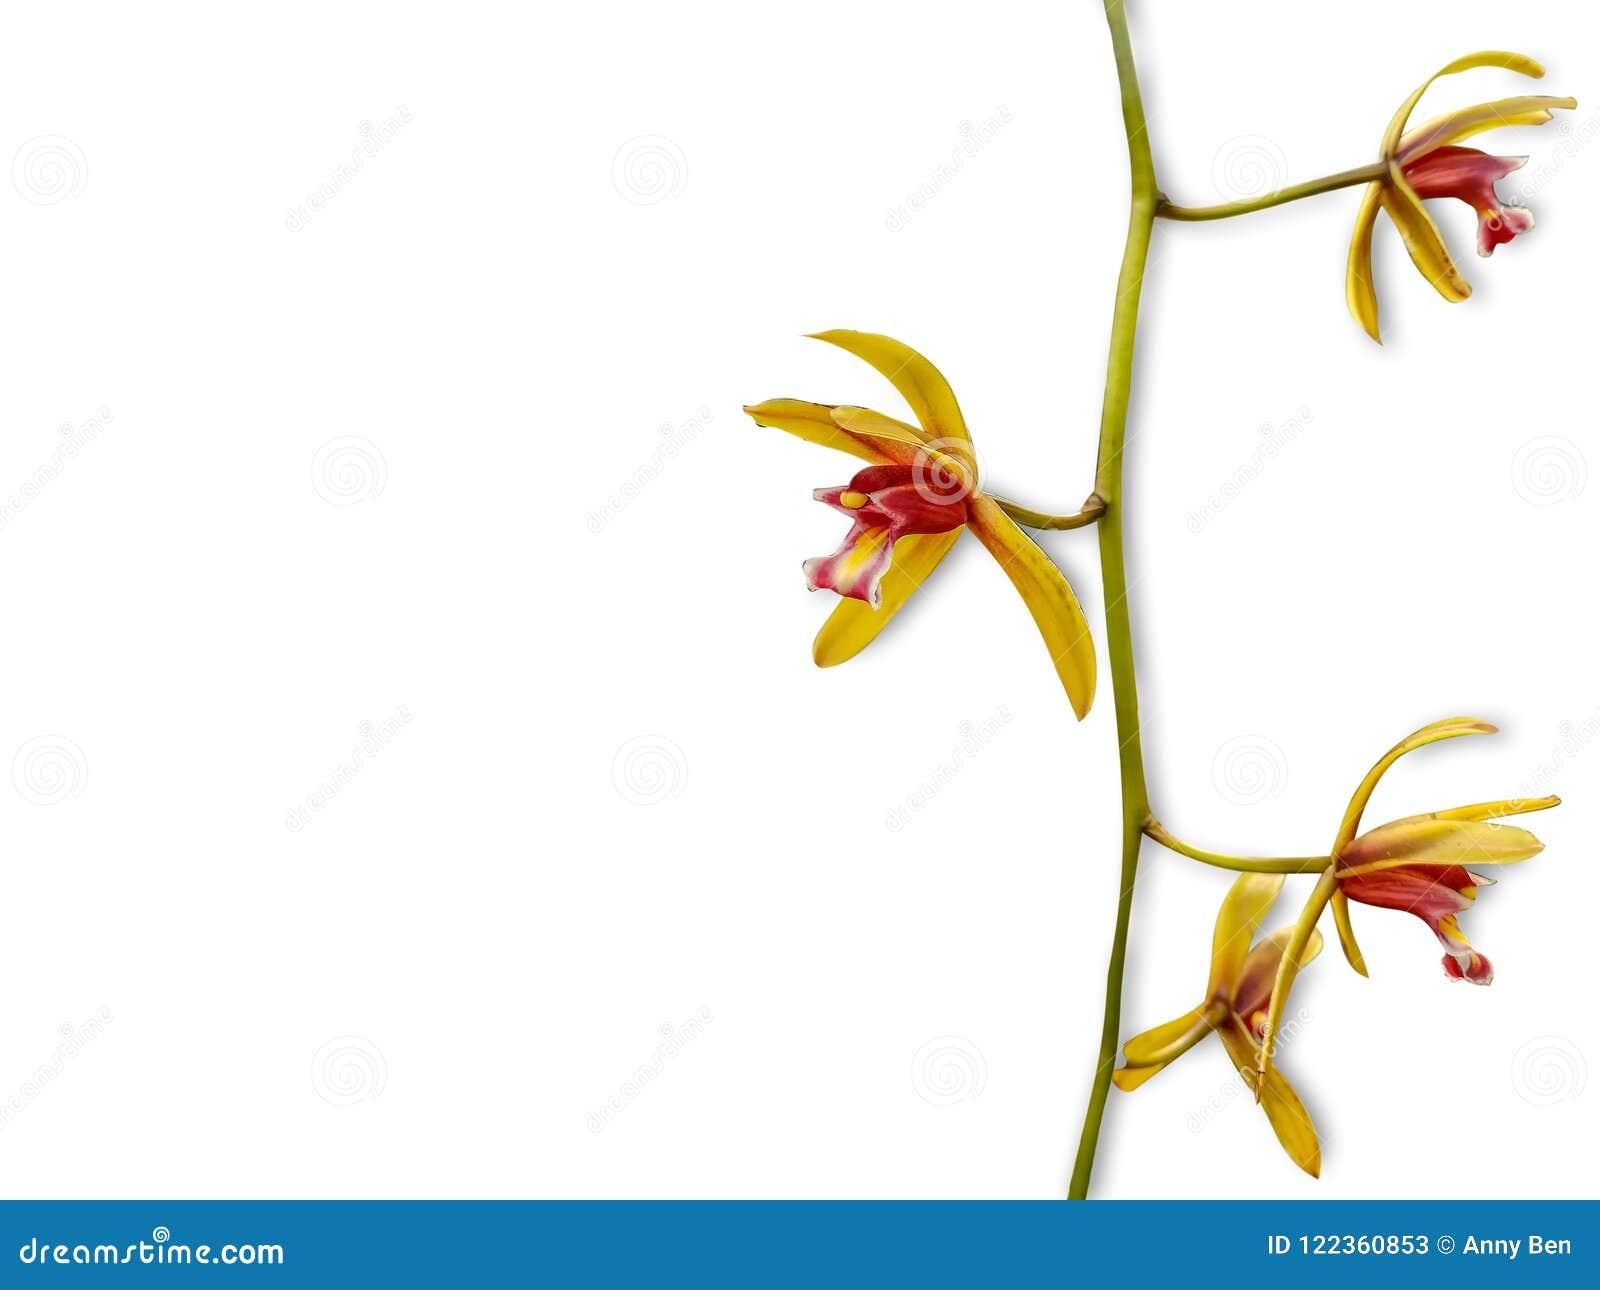 Wild orchid flower on white background